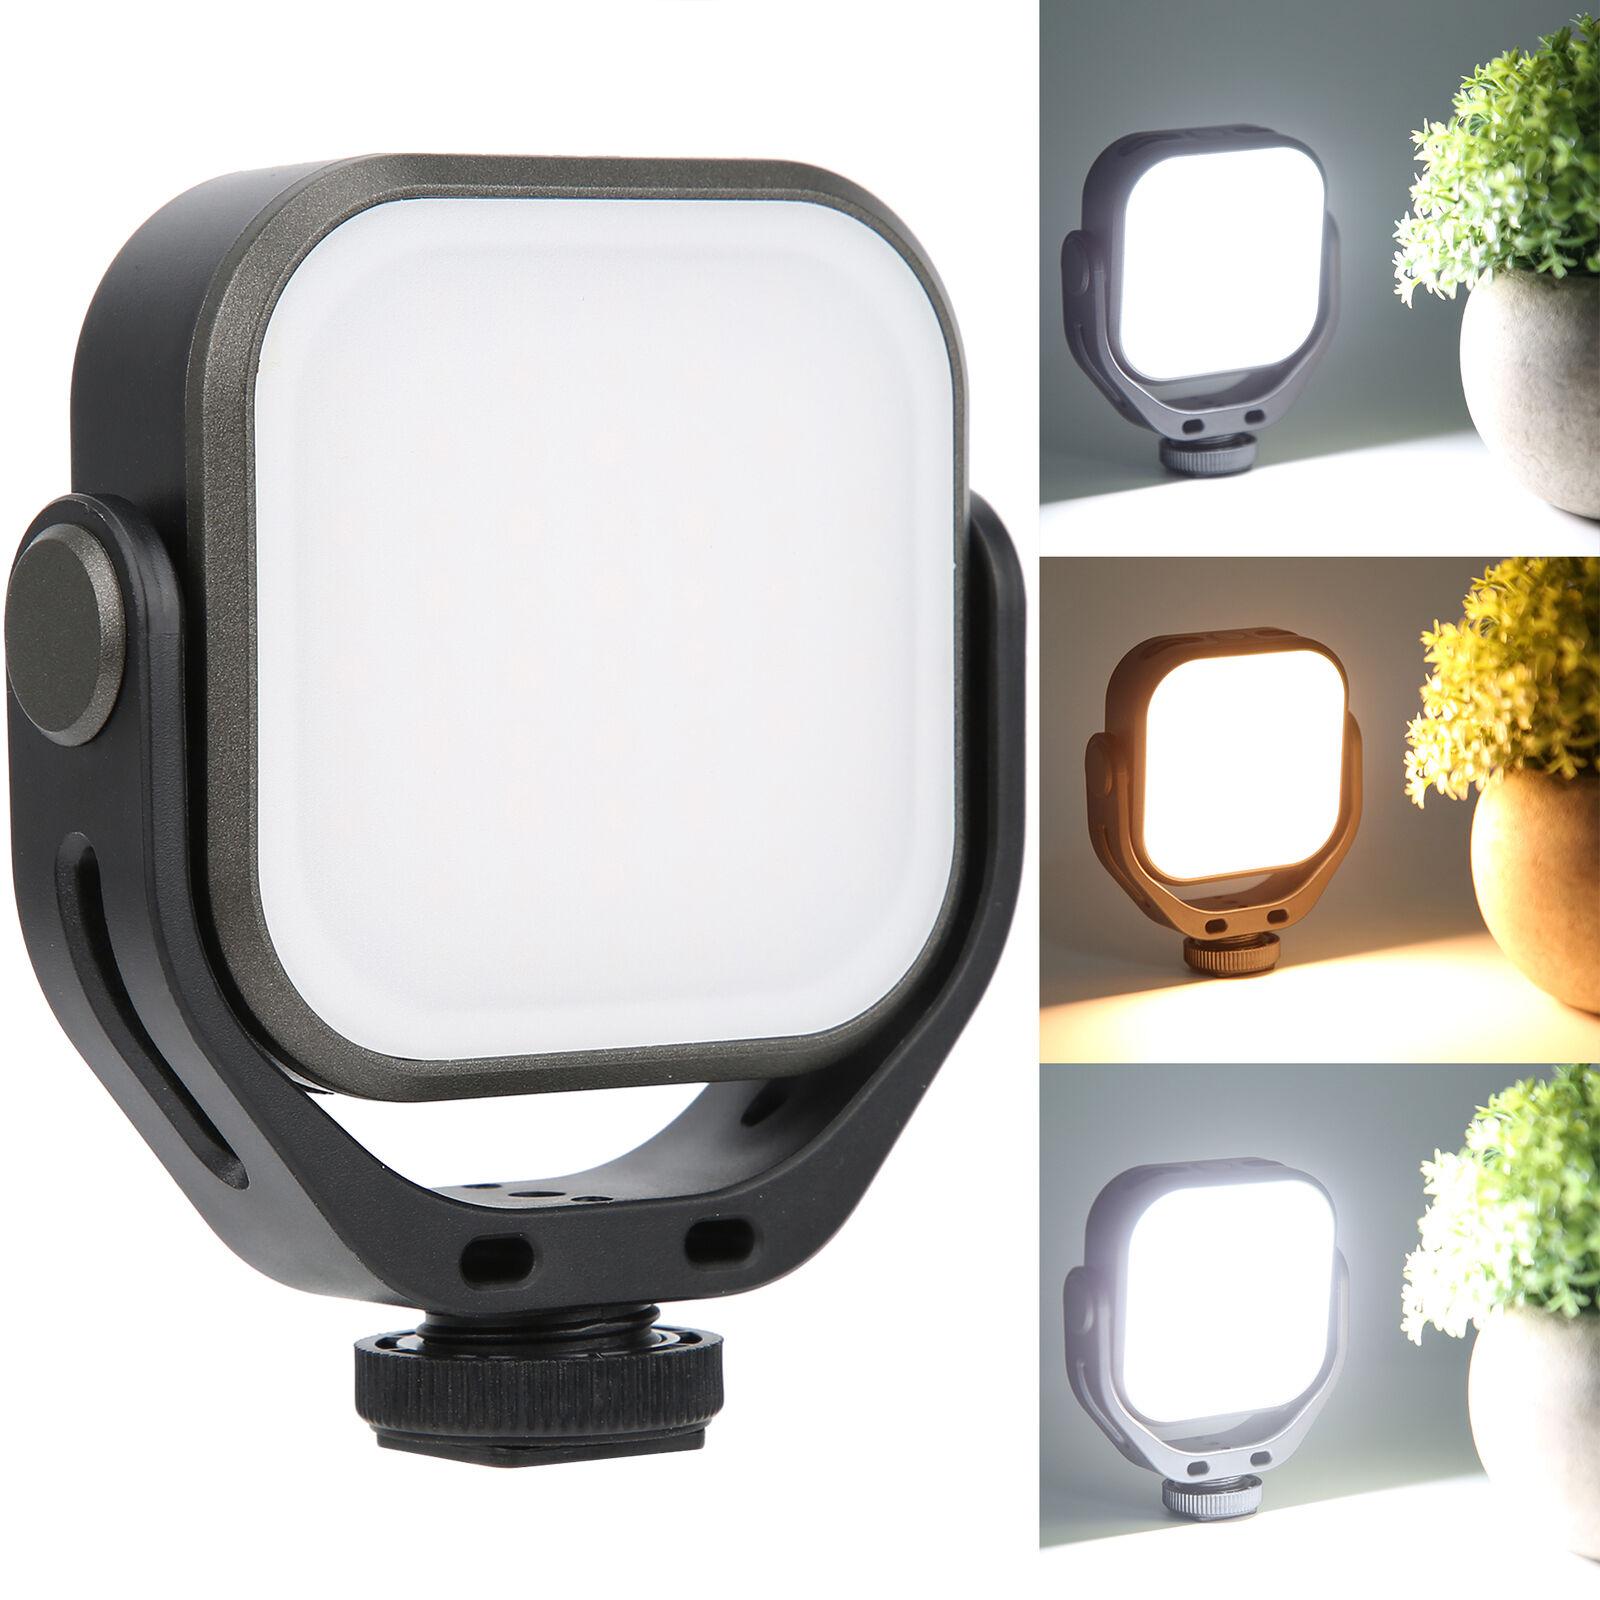 VIJIM VL66 LED Fill Light Lamp Type-C Charging Interface for Mirrorless Camera